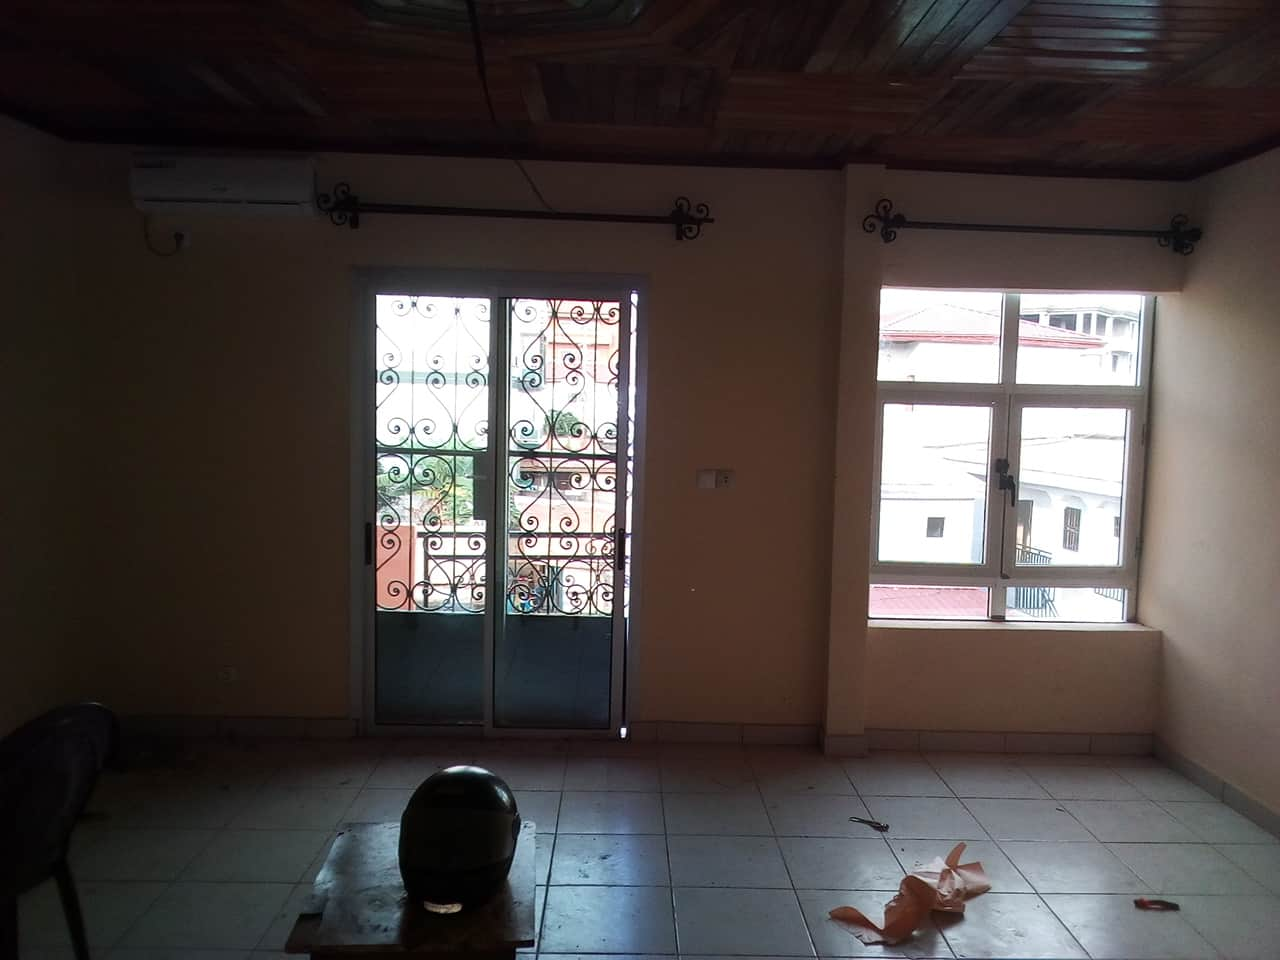 Apartment to rent - Yaoundé, Mfandena, mpas loin davenue foe - 1 living room(s), 2 bedroom(s), 2 bathroom(s) - 225 000 FCFA / month